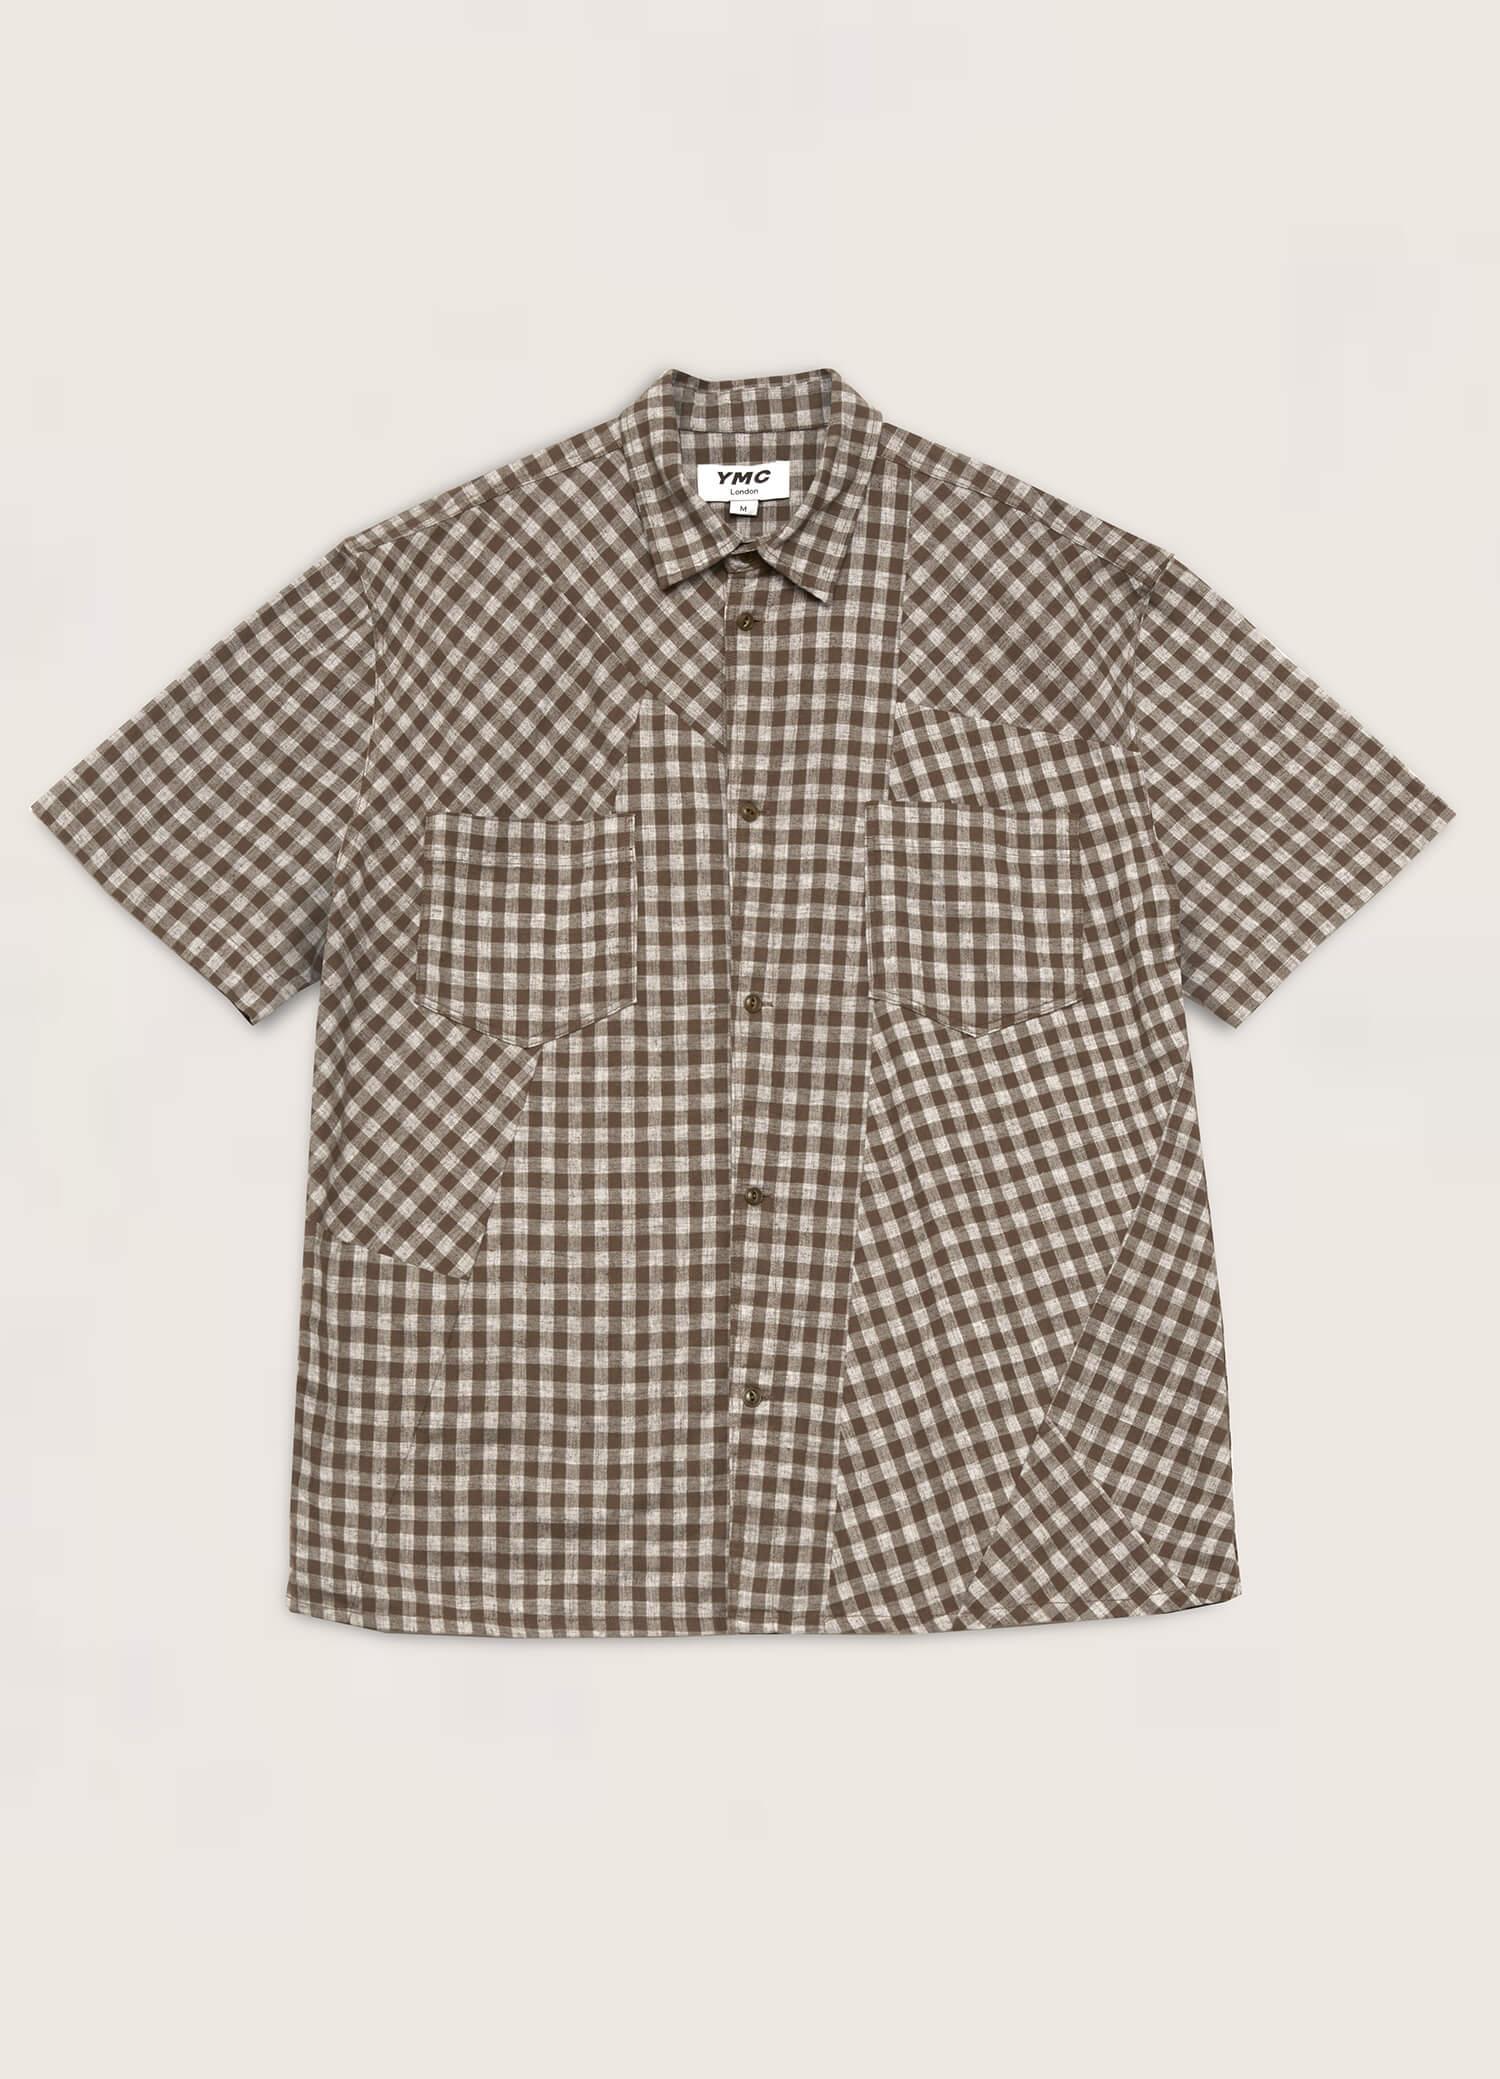 Mitchum Patchwork Check Shirt Olive